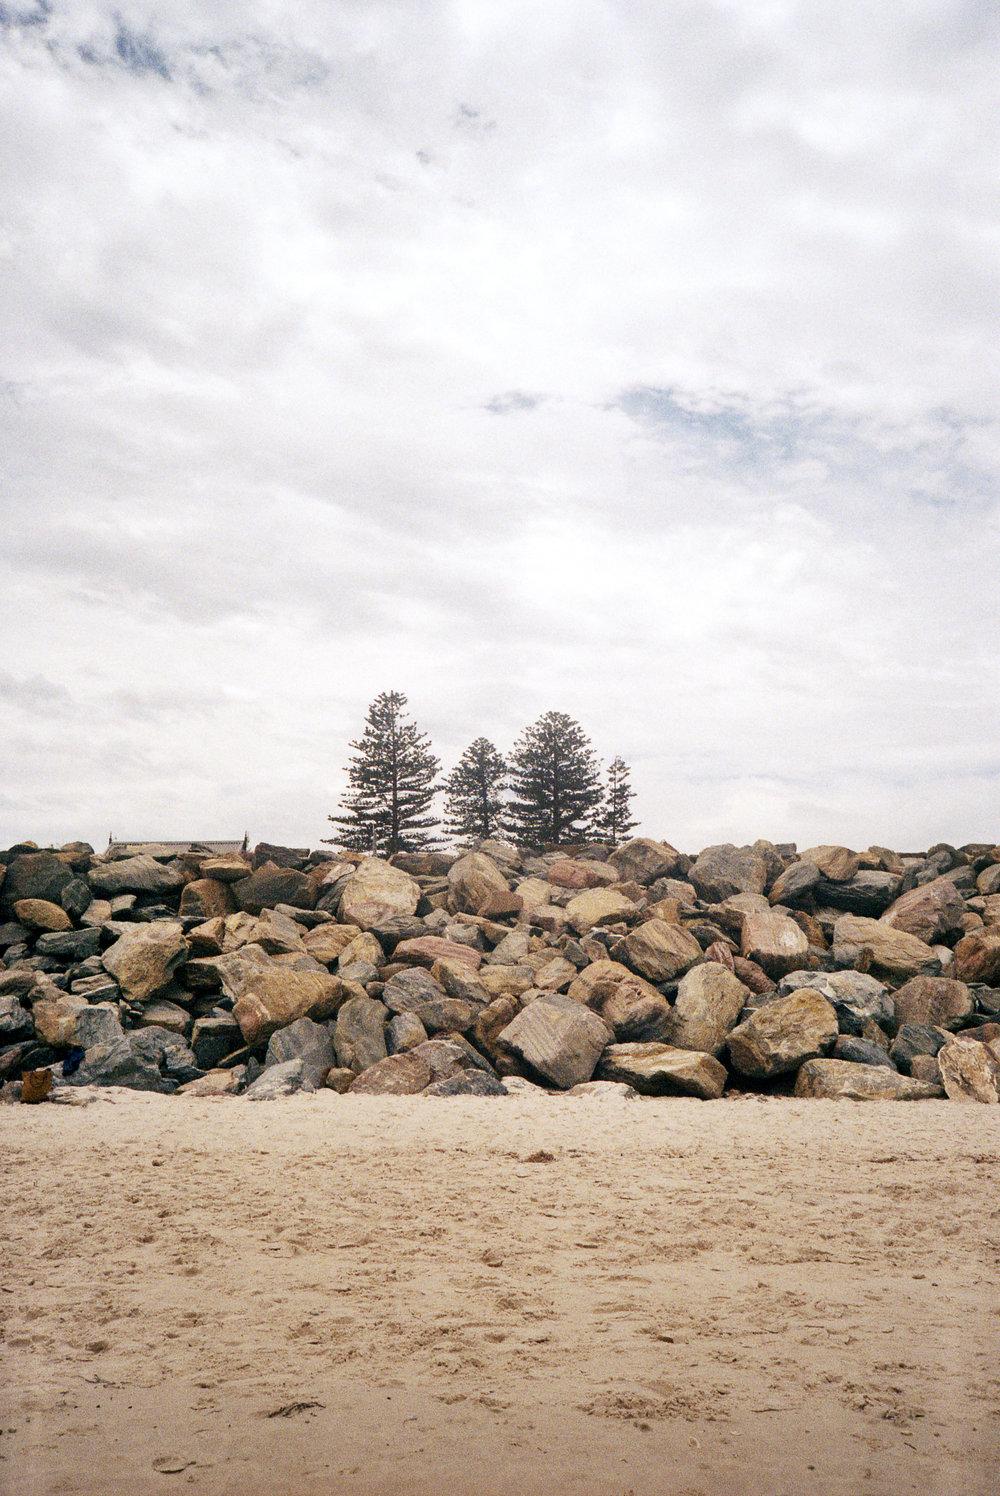 Australia, January 2019, 35mm color film photograph